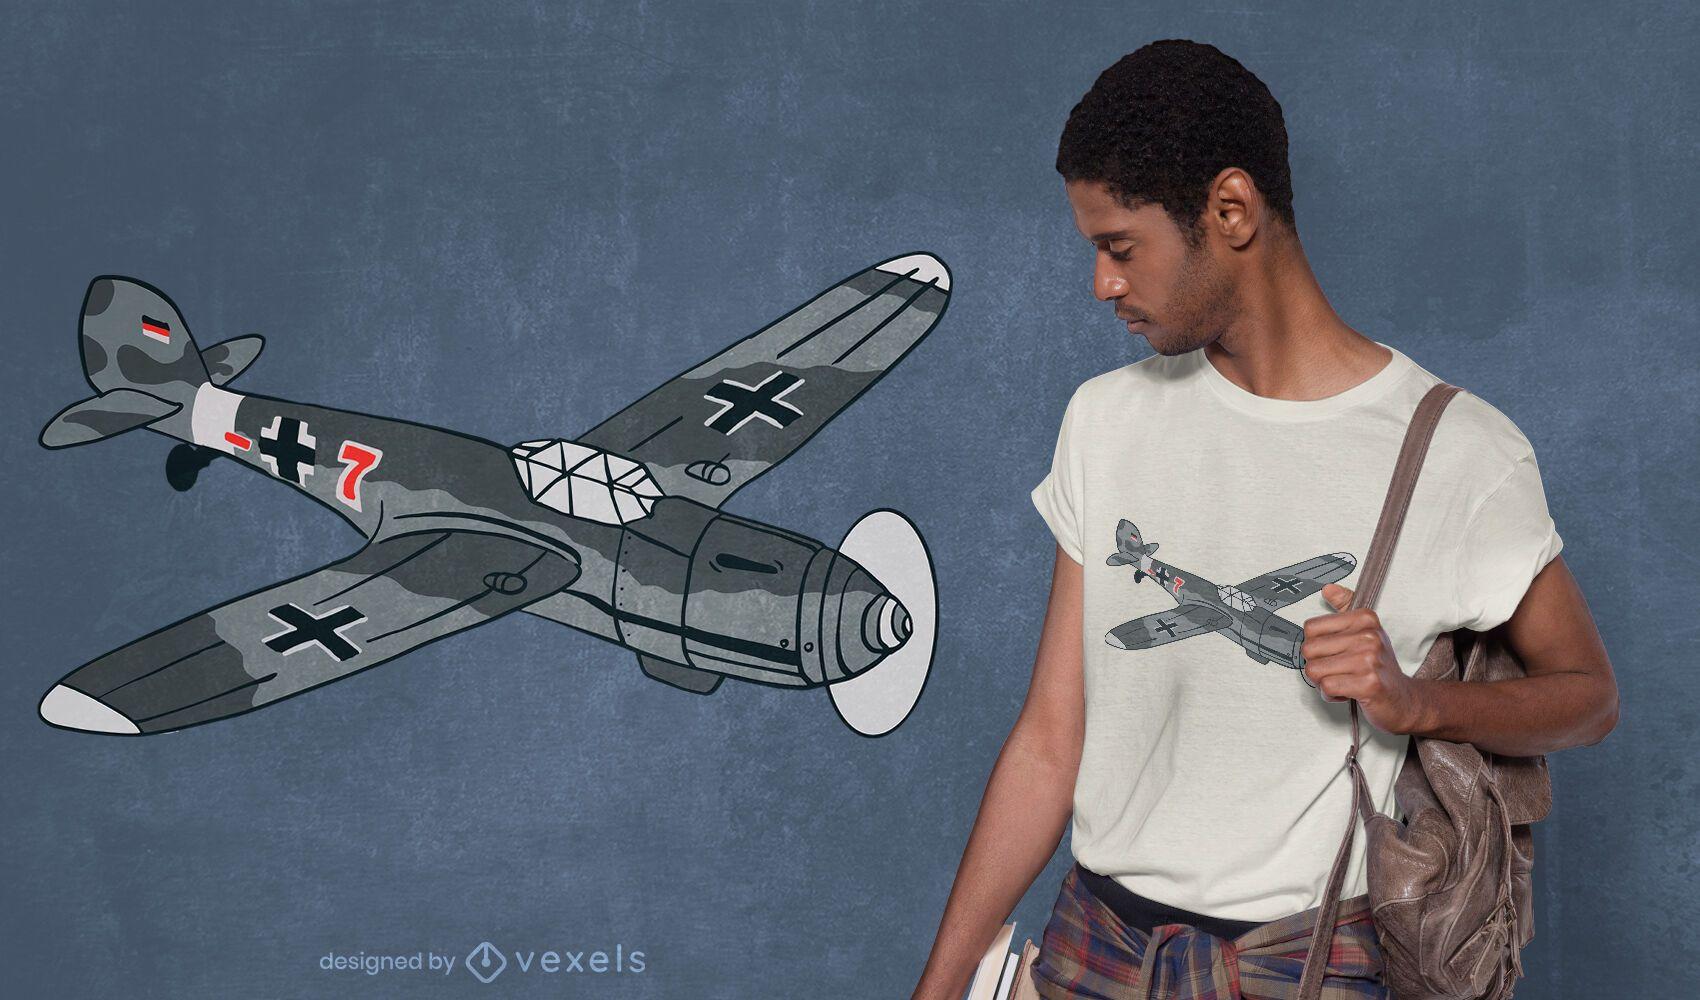 Bf 109 aircraft t-shirt design